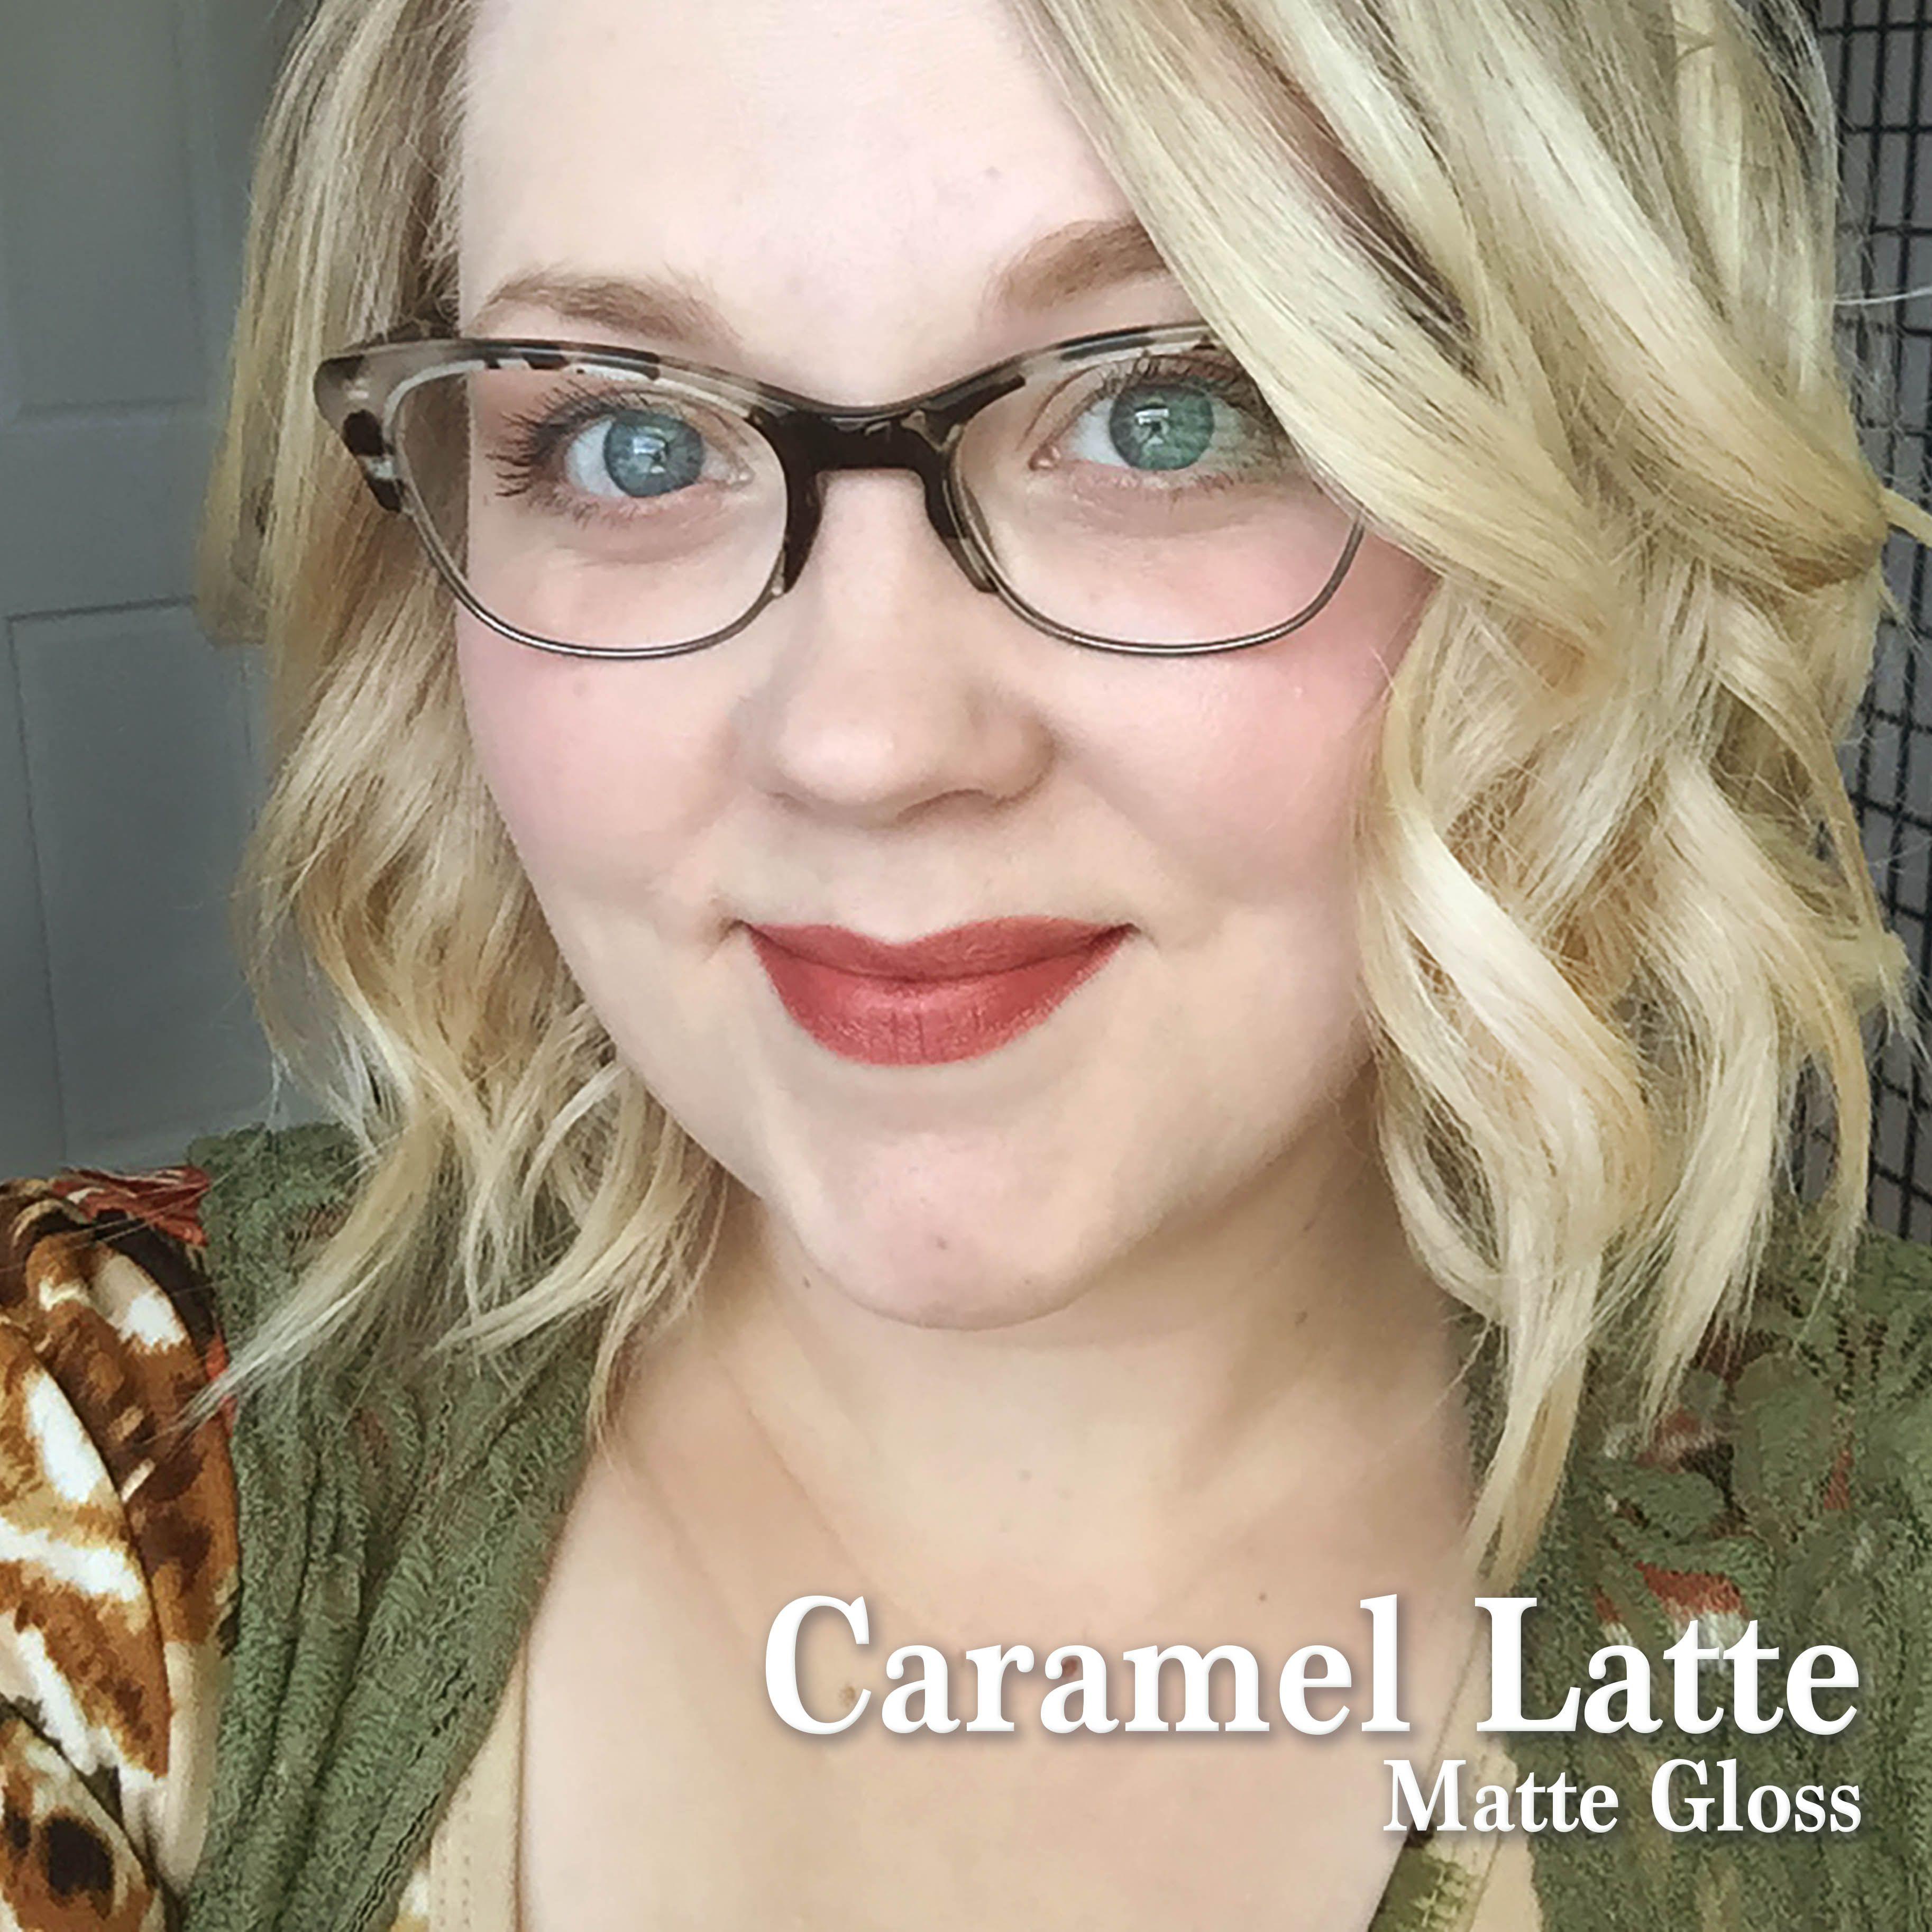 Caramel Latte LipSense, Matte Gloss